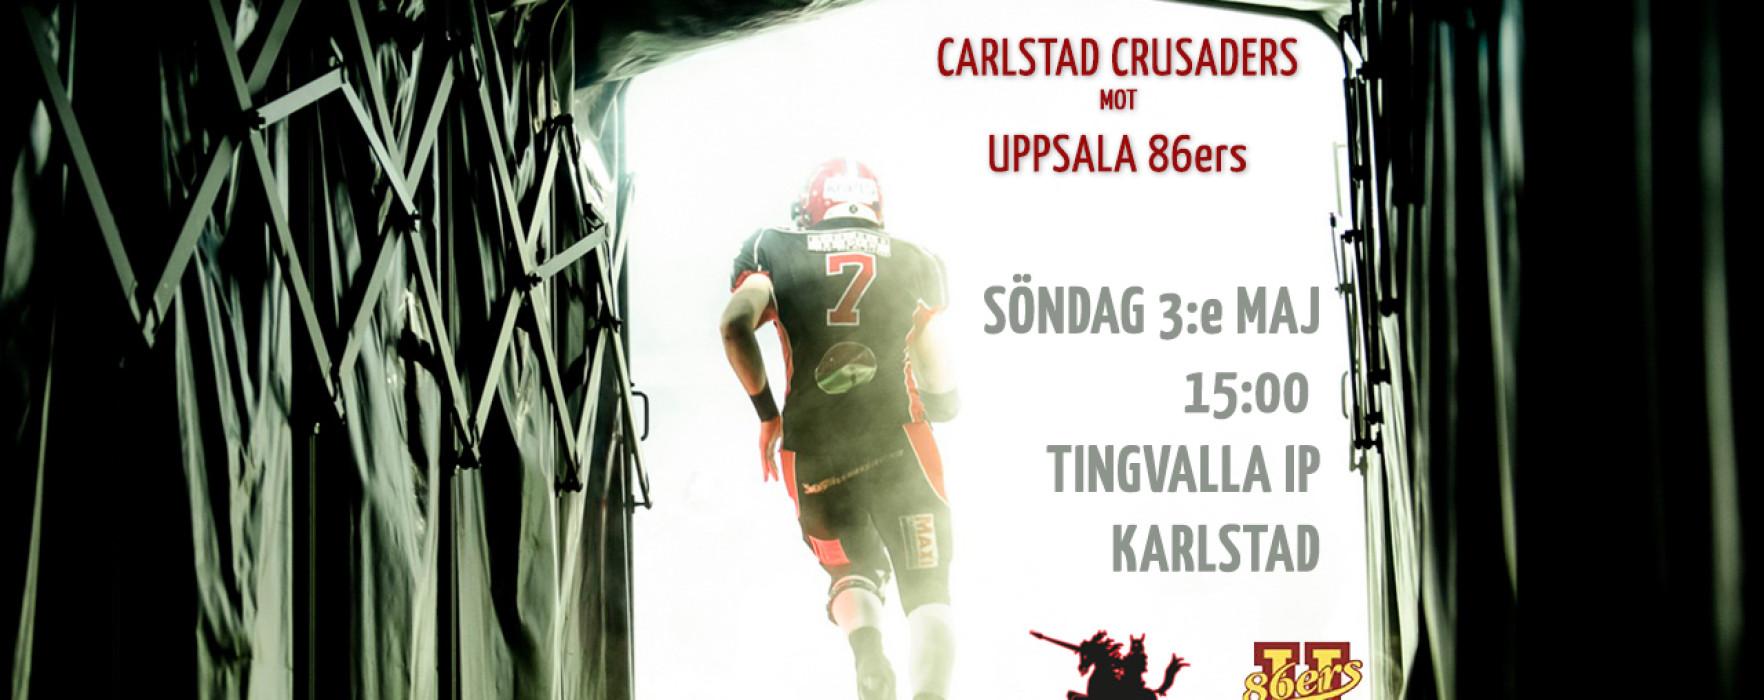 Carlstad Crusaders – Uppsala 86ers